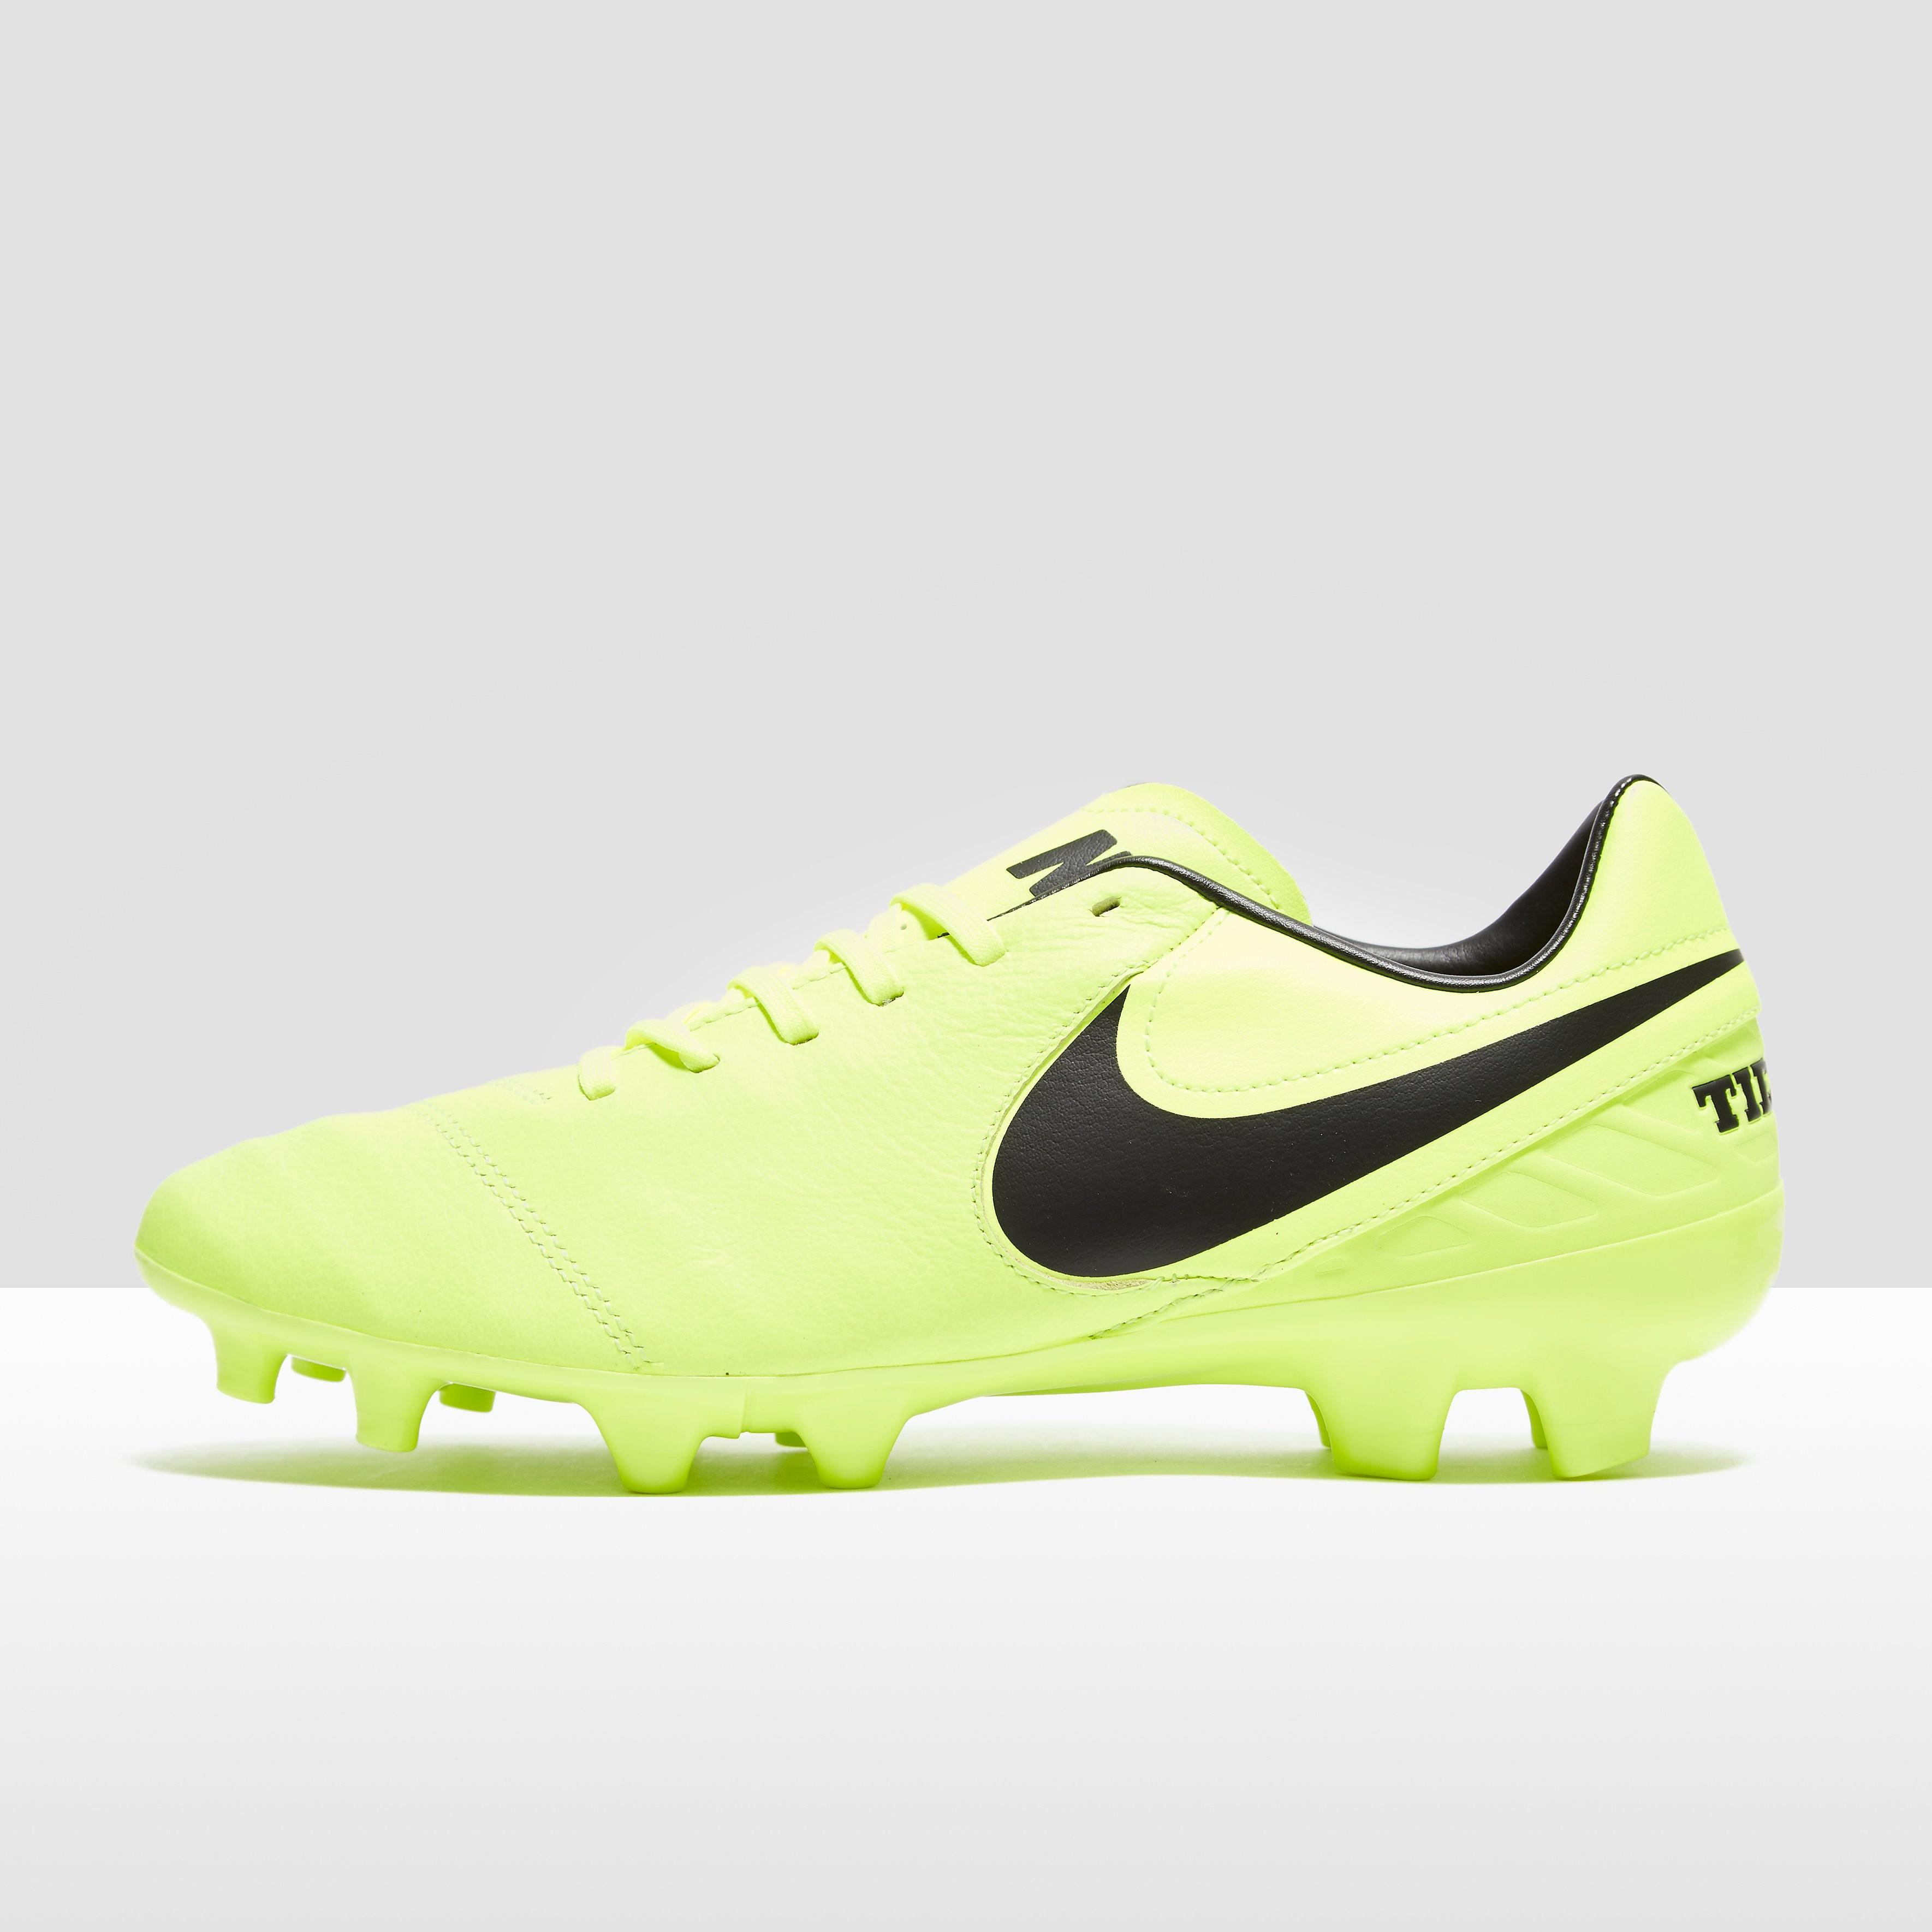 Nike Radiant Flare Tiempo Mystic Men's FG Football Boots